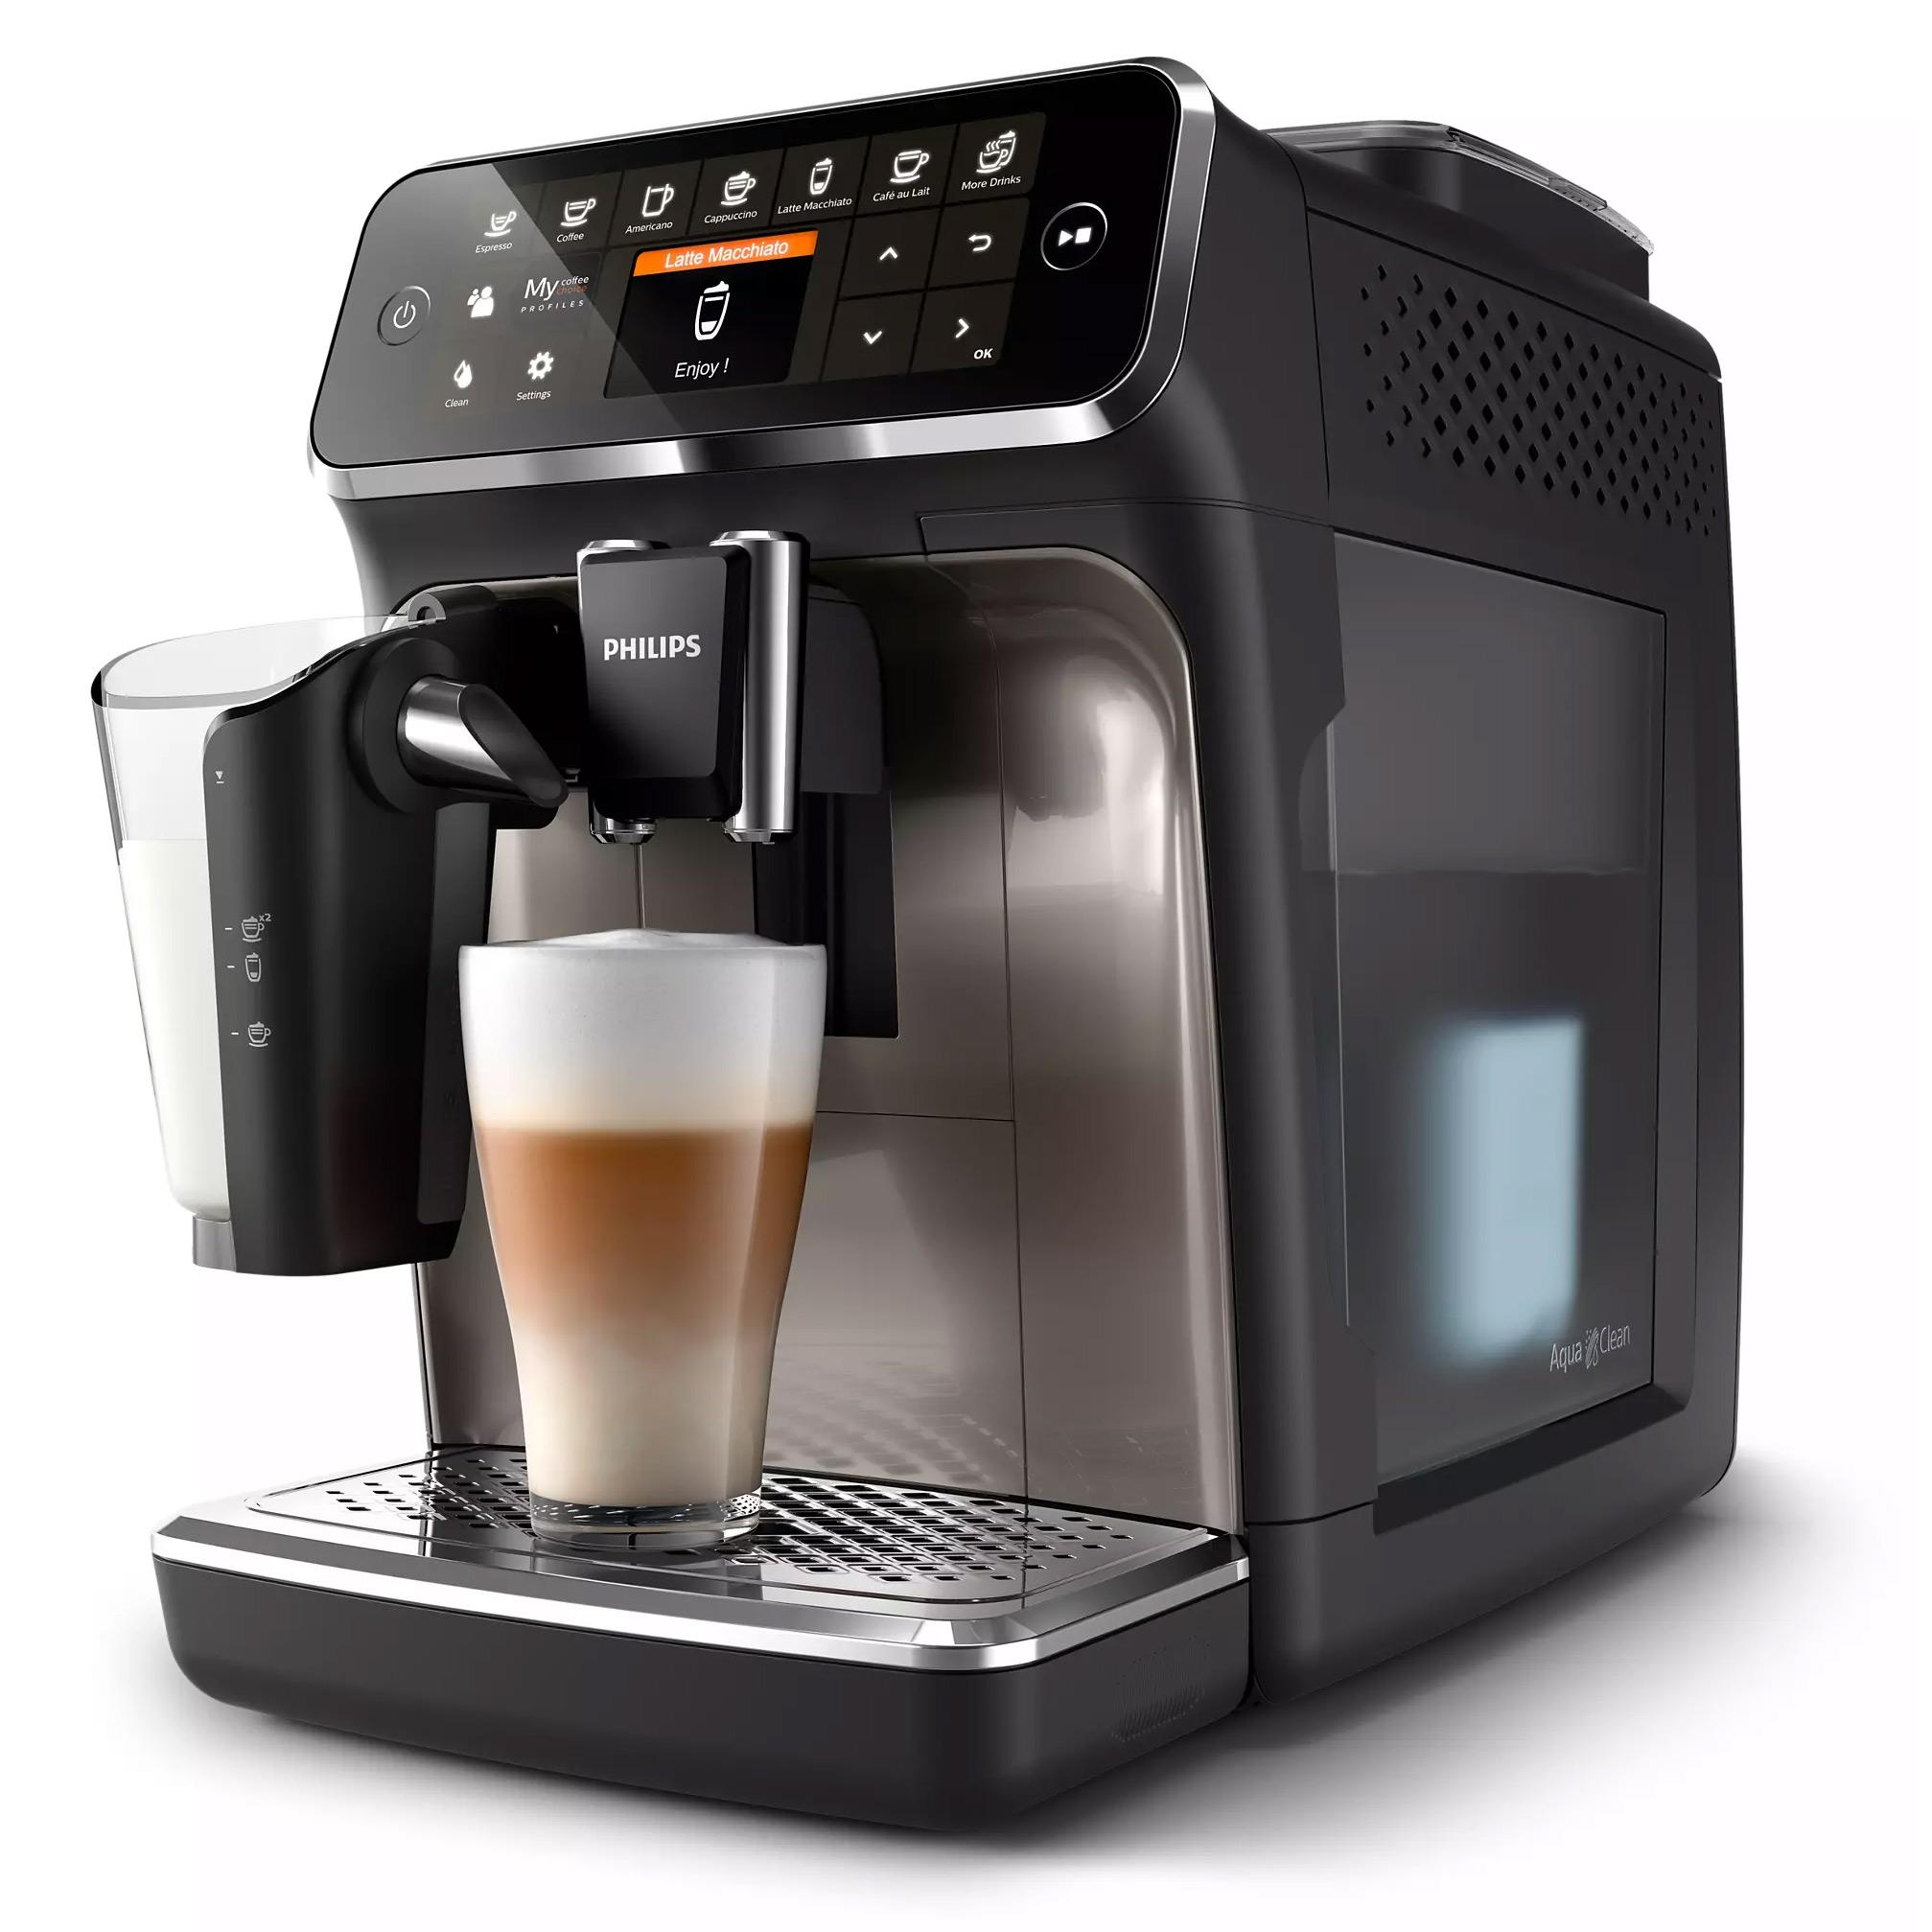 Philips / Saeco 4300 Series LatteGo Superautomatic Espresso Machine - EP4347/94